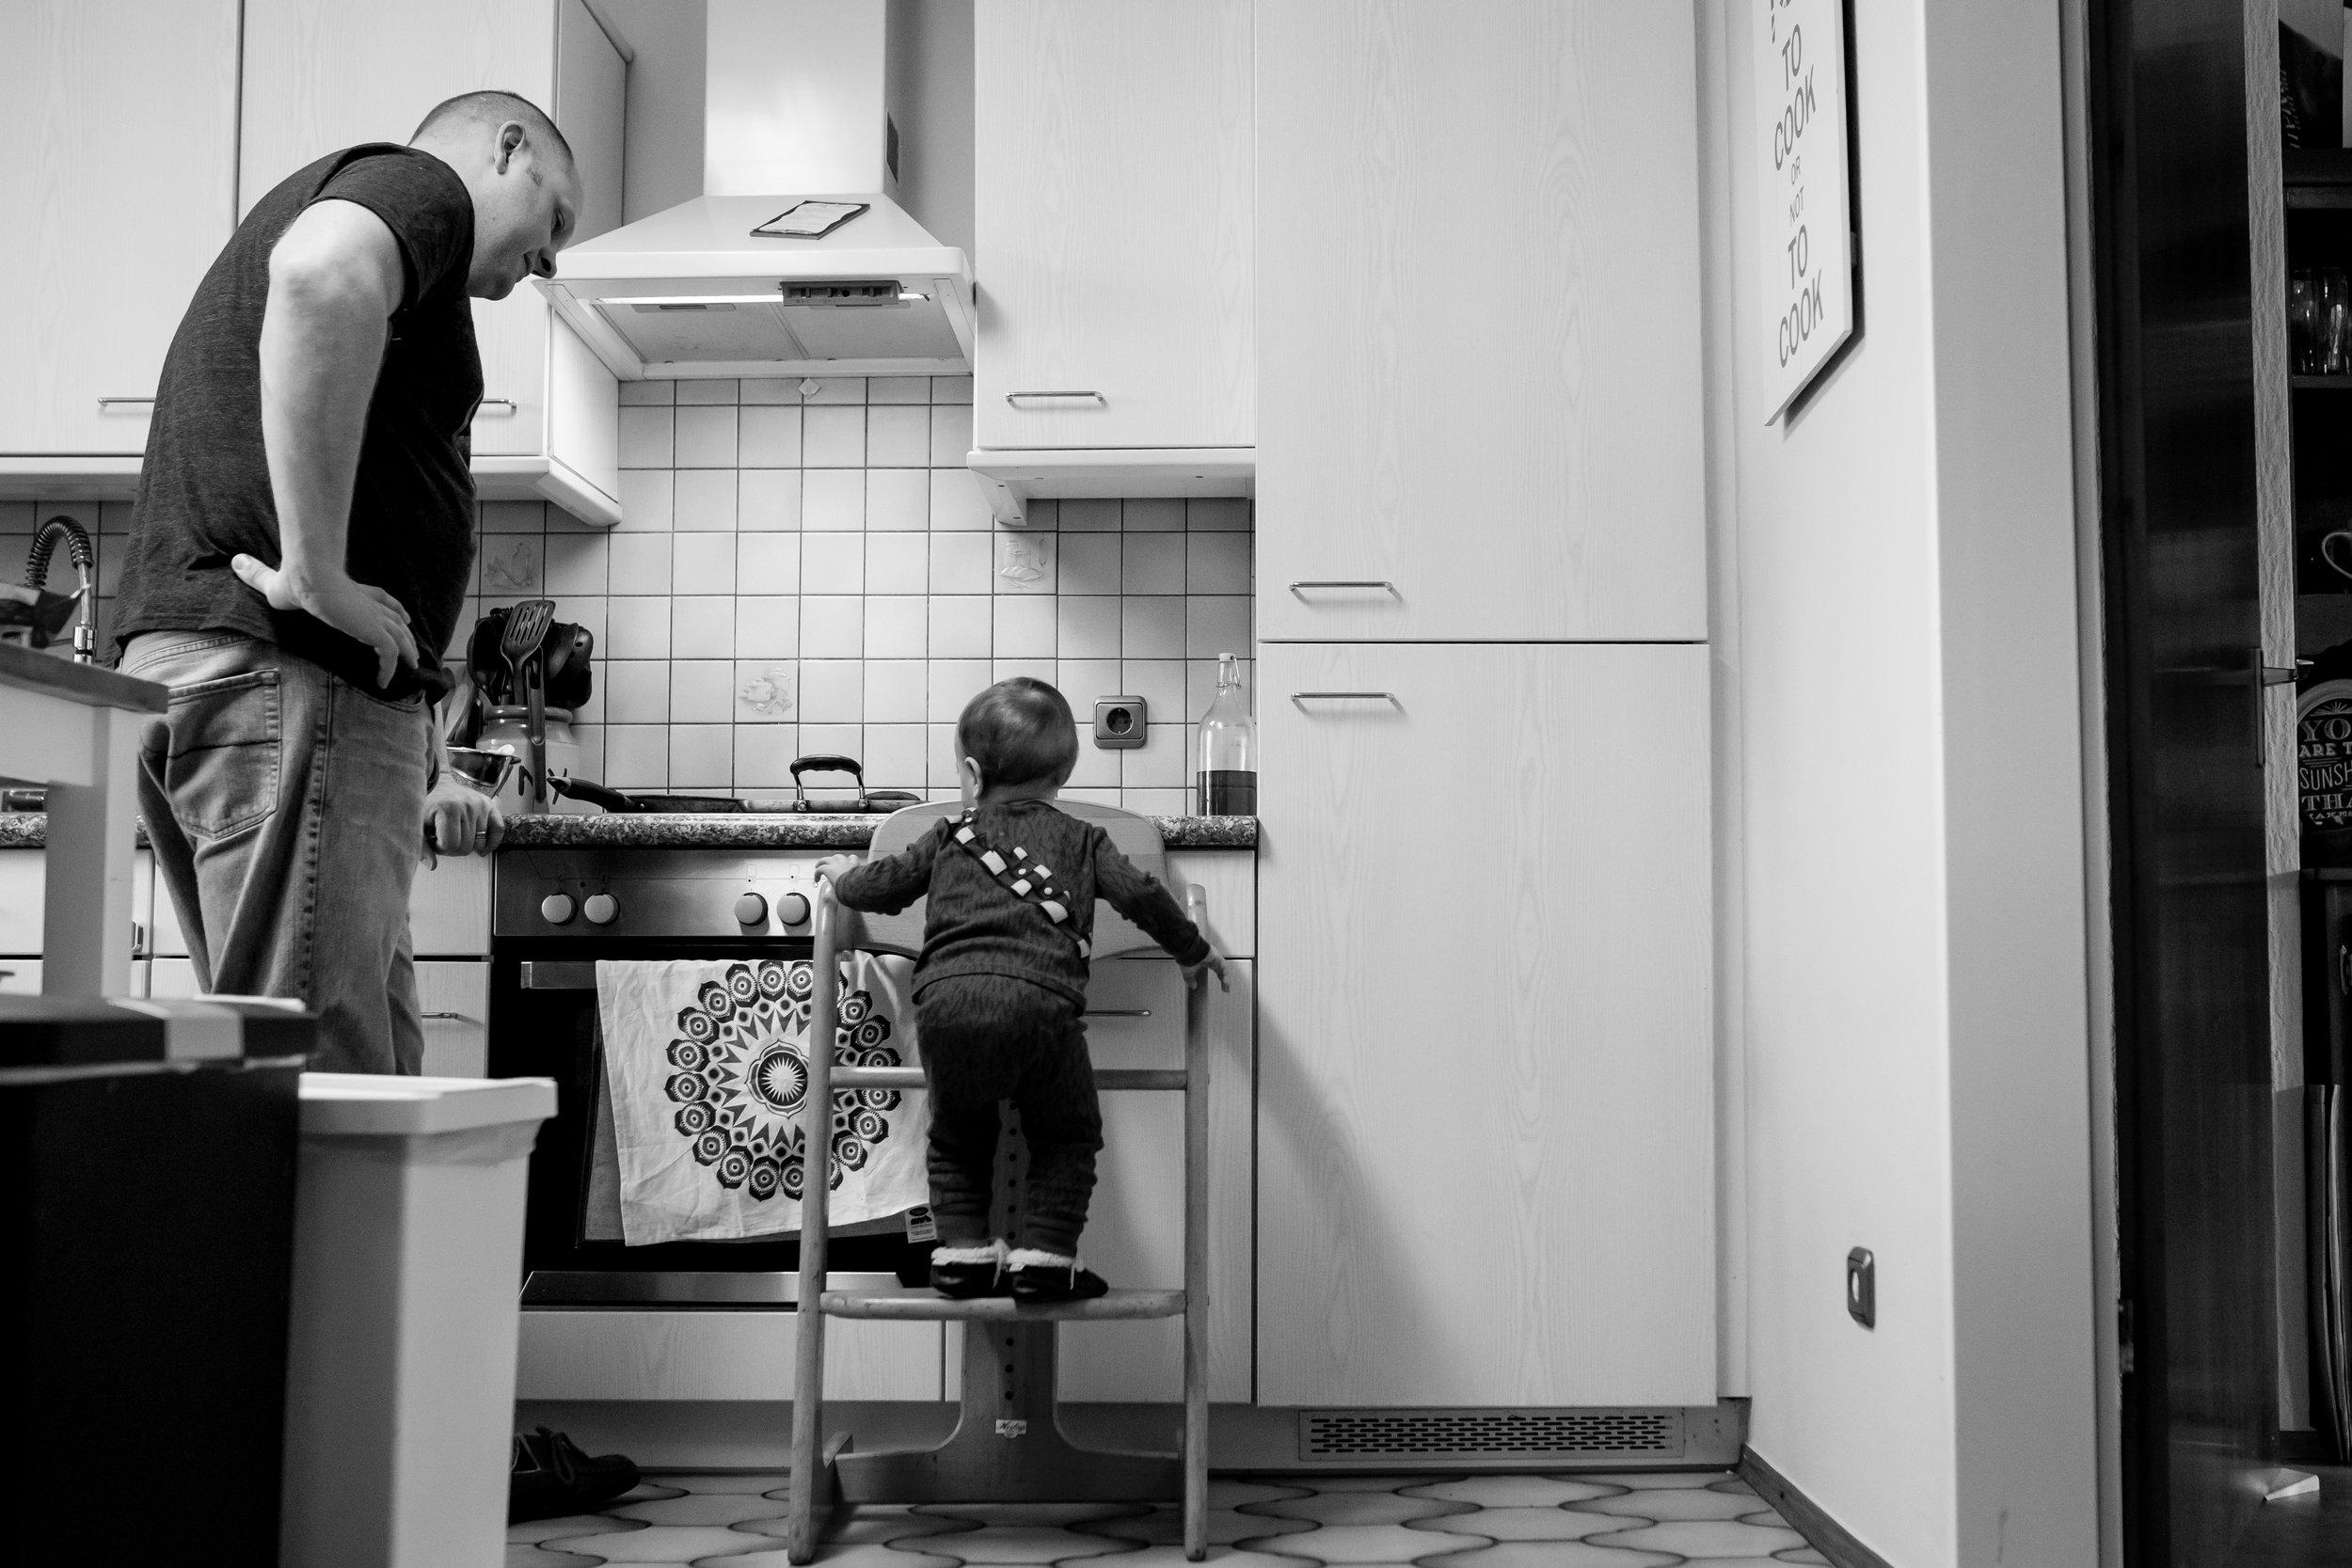 Boy climbs onto stool to help Dad cook